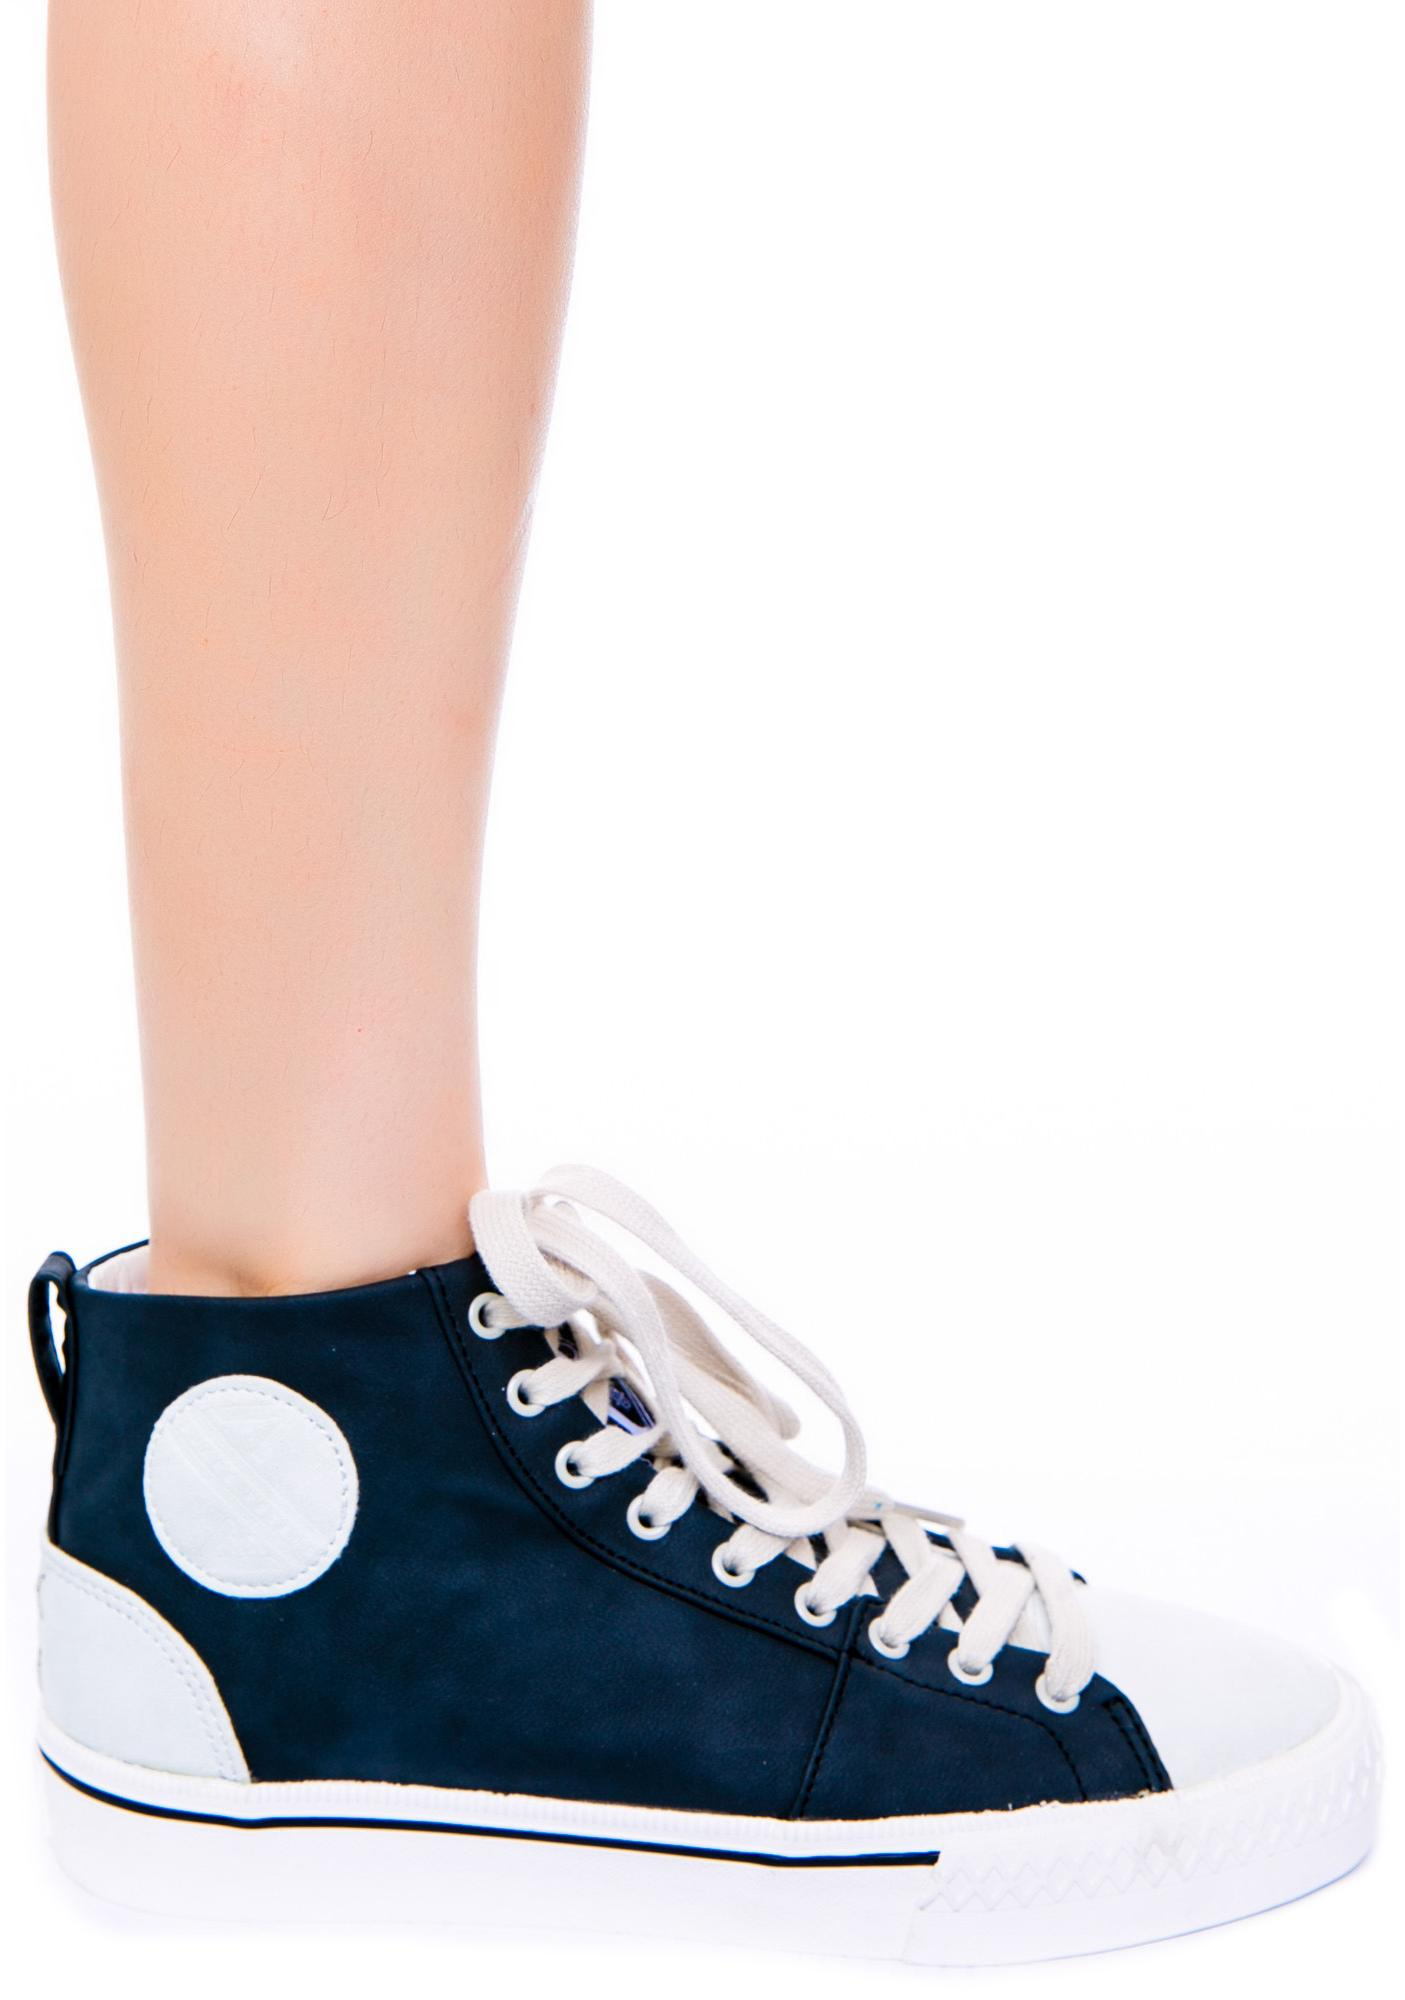 Iron Fist Duane Peters Broadway High Top Sneaker